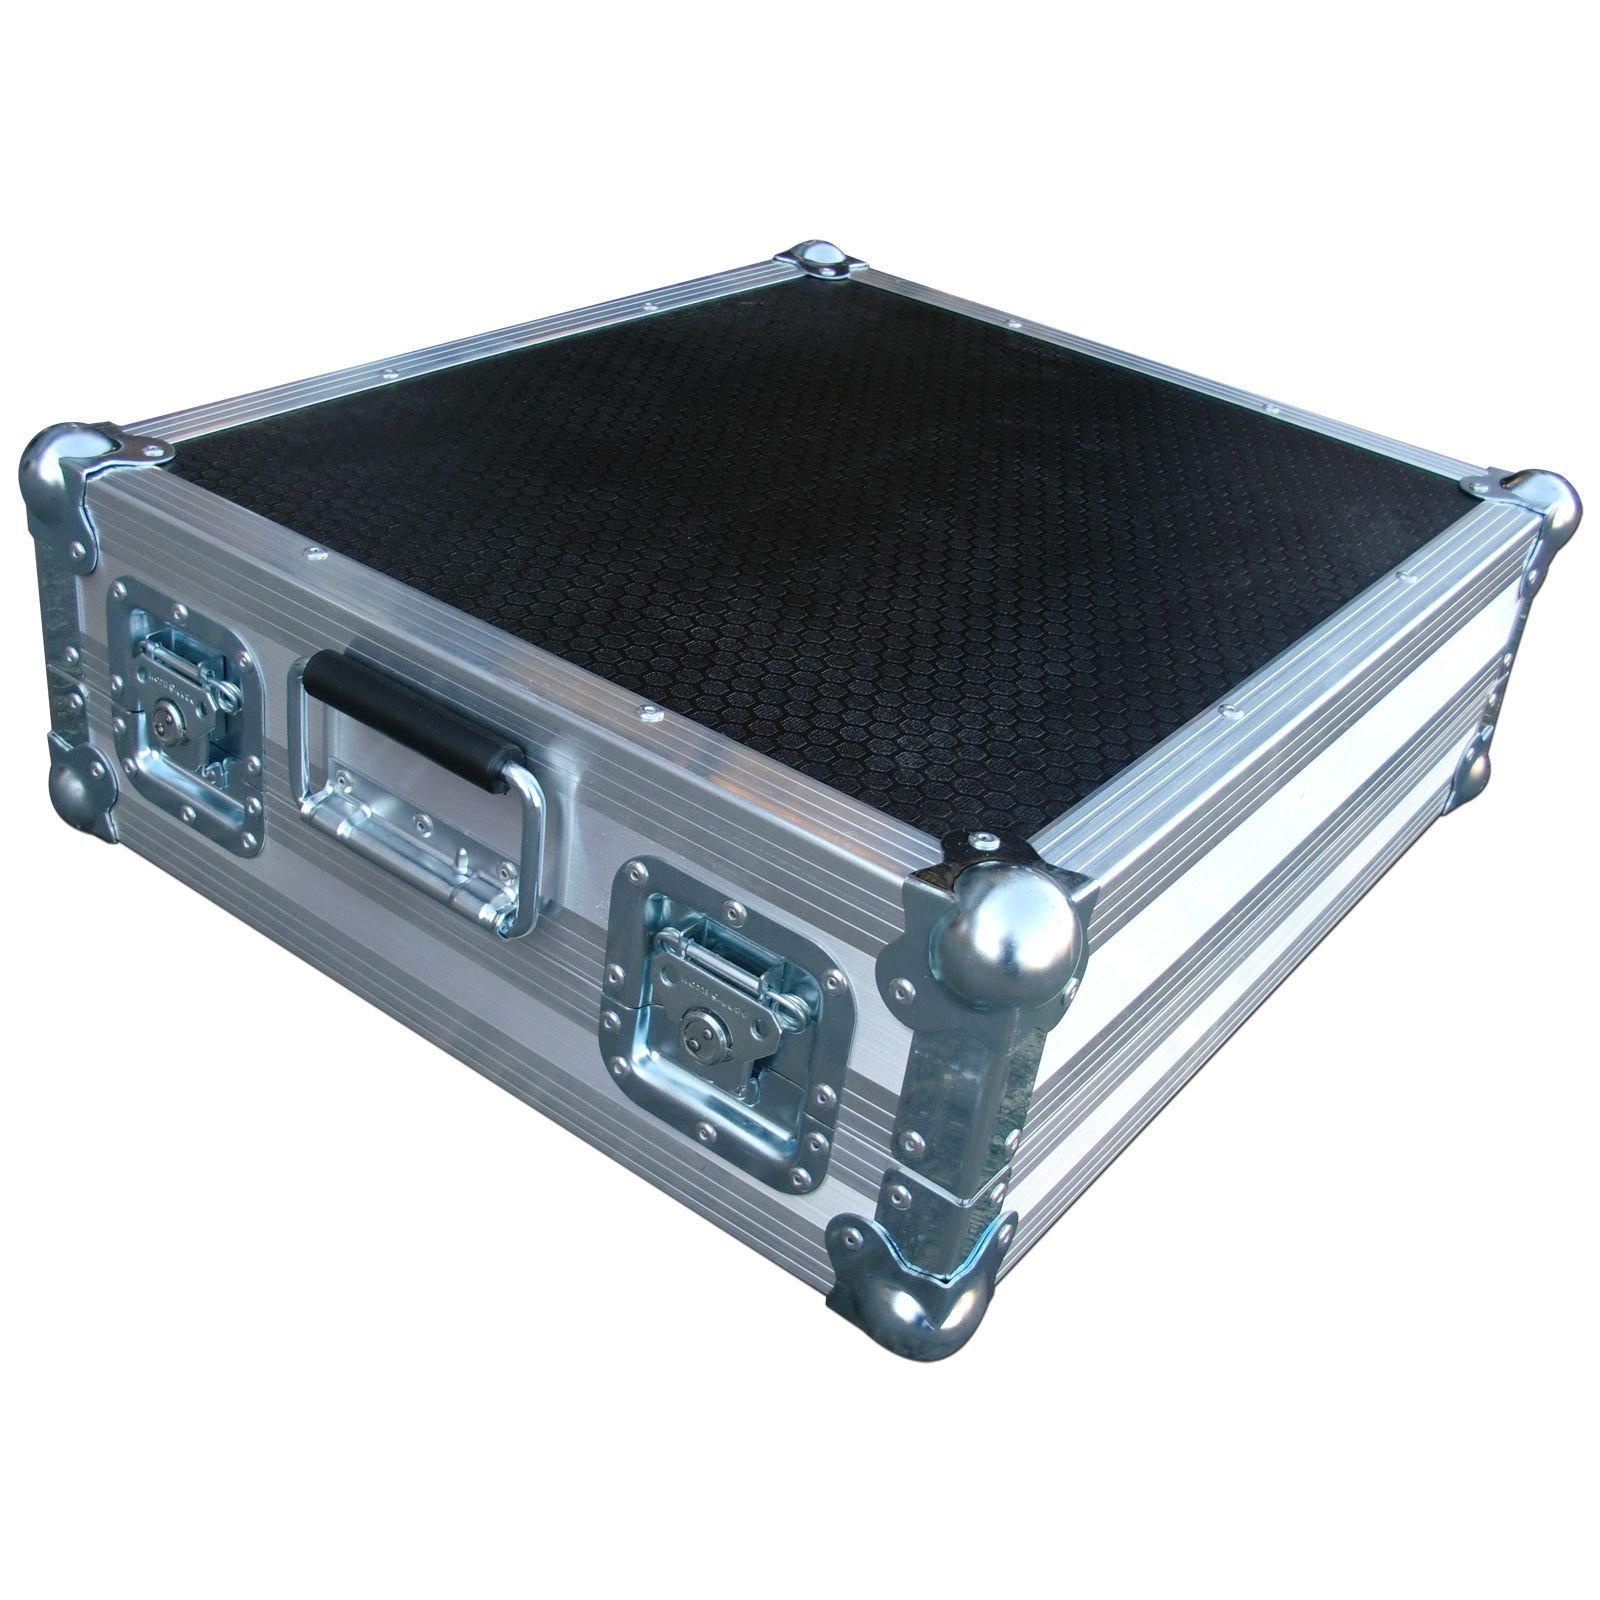 mackie cfx 12 mixer flight case. Black Bedroom Furniture Sets. Home Design Ideas